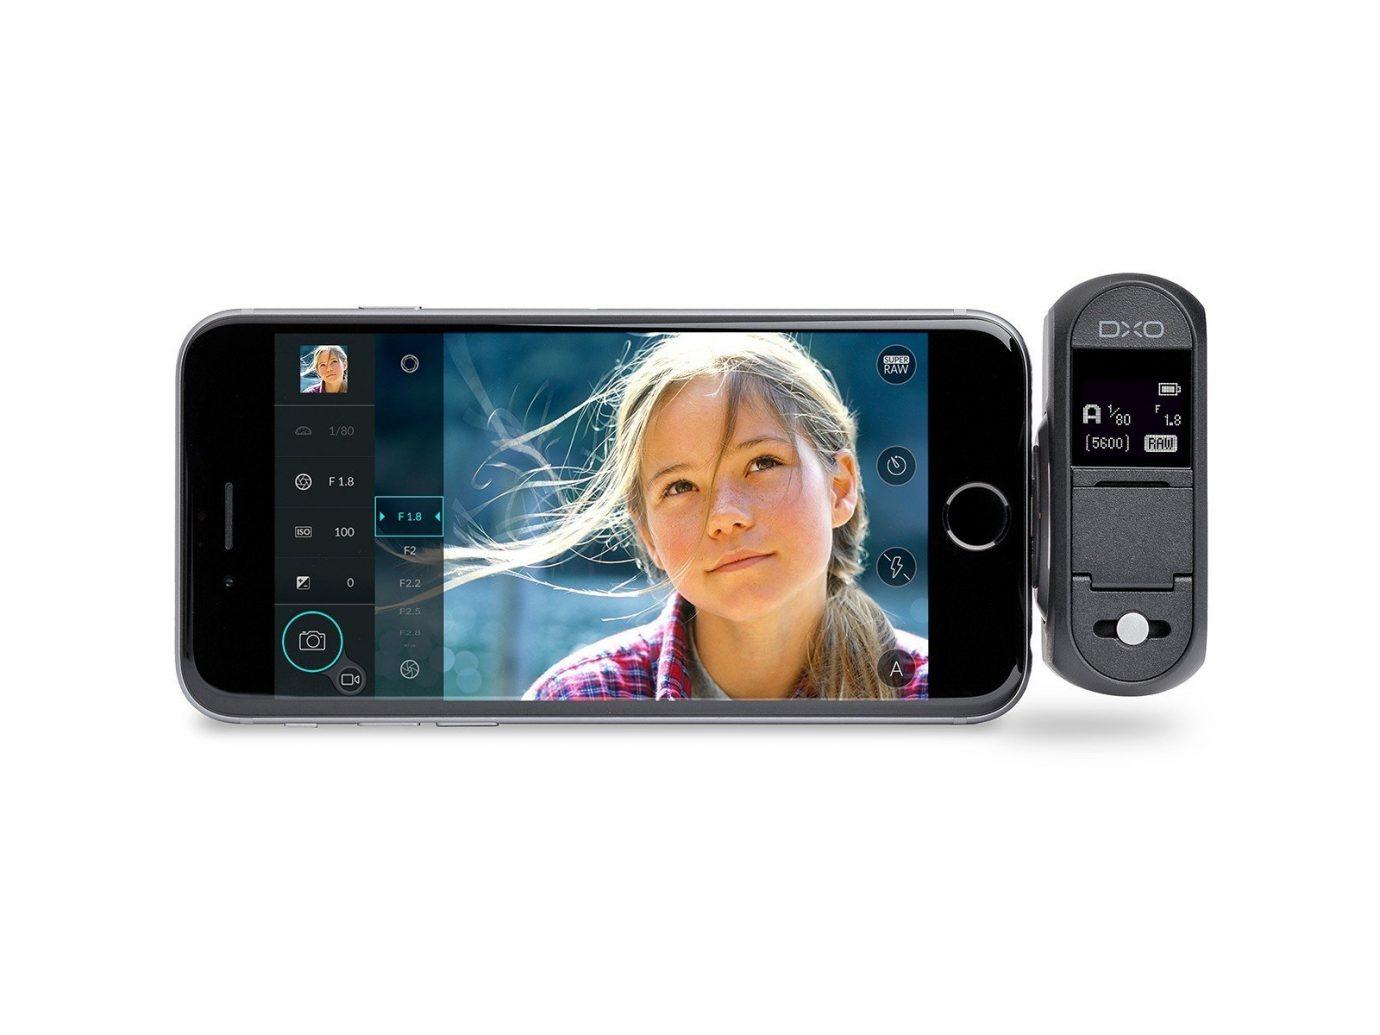 Travel Tips digital camera product camera cameras & optics electronics mobile phone multimedia smartphone mp3 player gadget technology